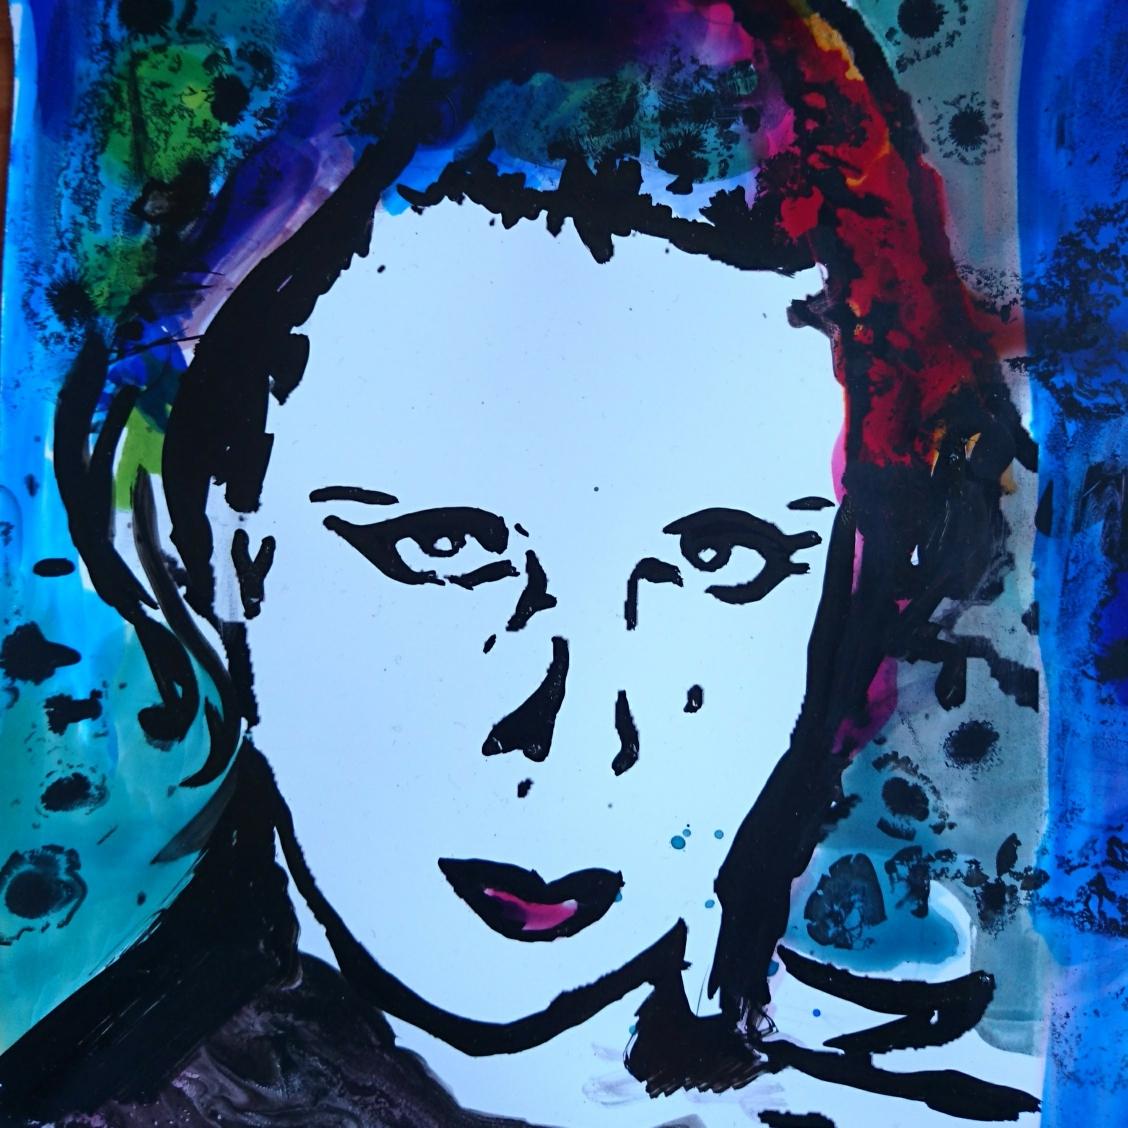 Tamara de Lempicka, painter, artist